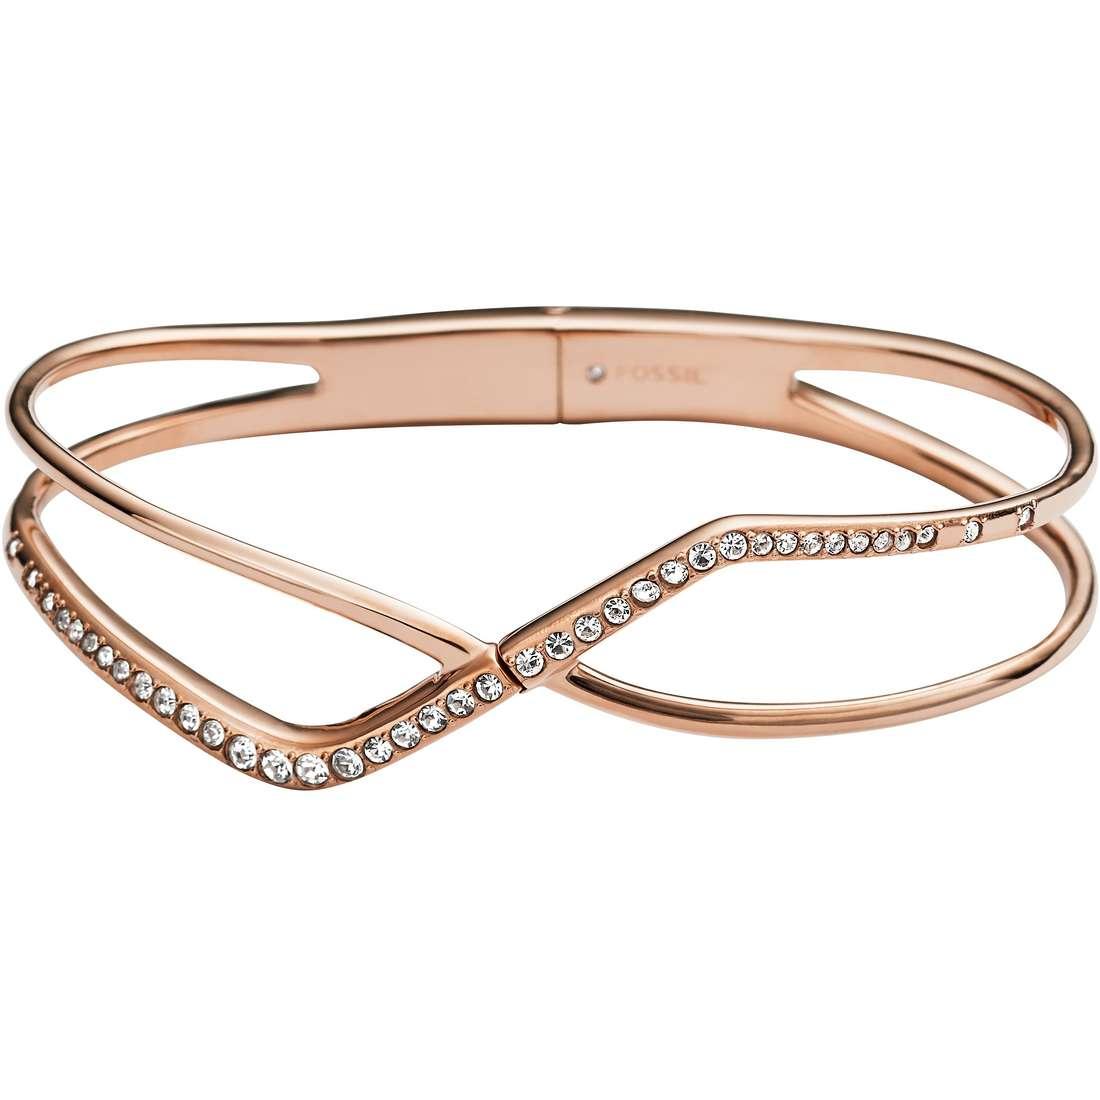 bracelet woman jewellery Fossil Spring 16 JF02253791